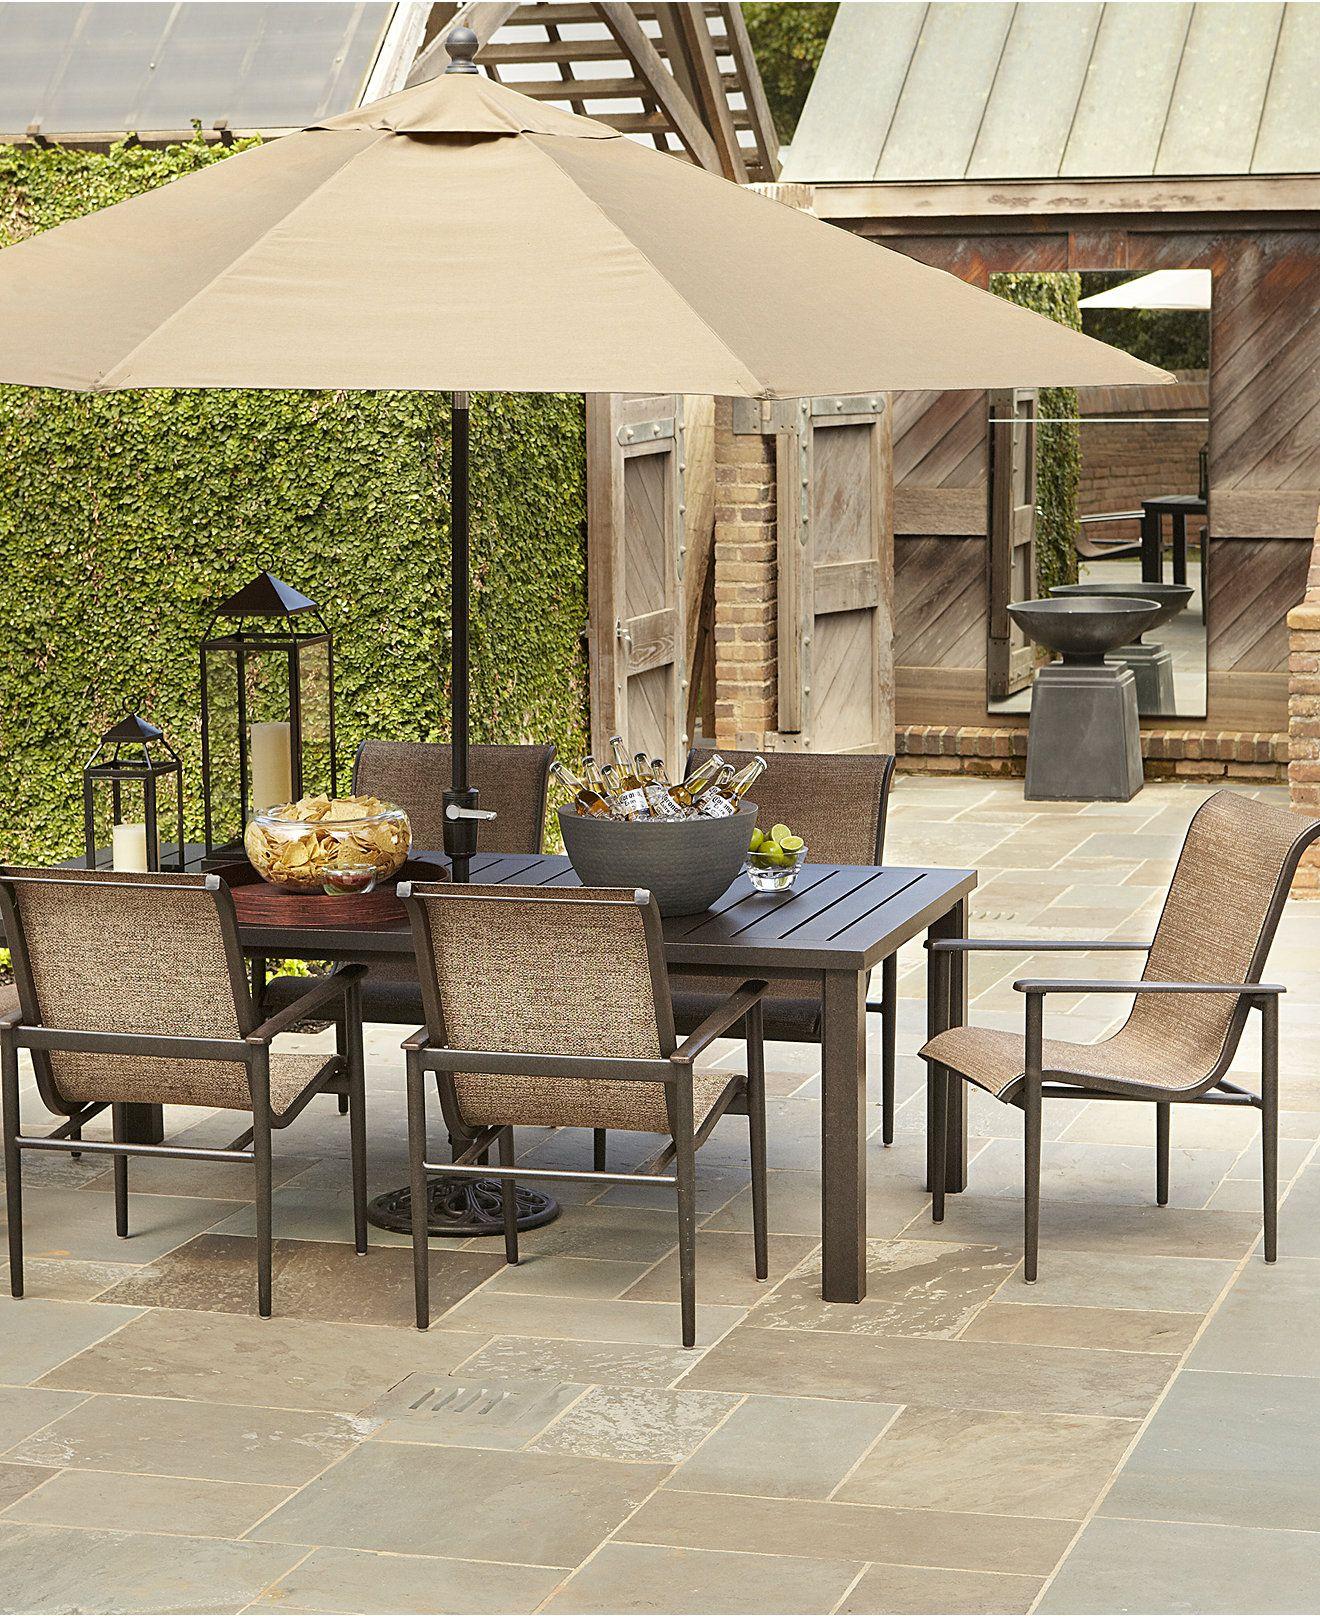 Badgley Outdoor Patio Furniture Dining Sets & Pieces 84